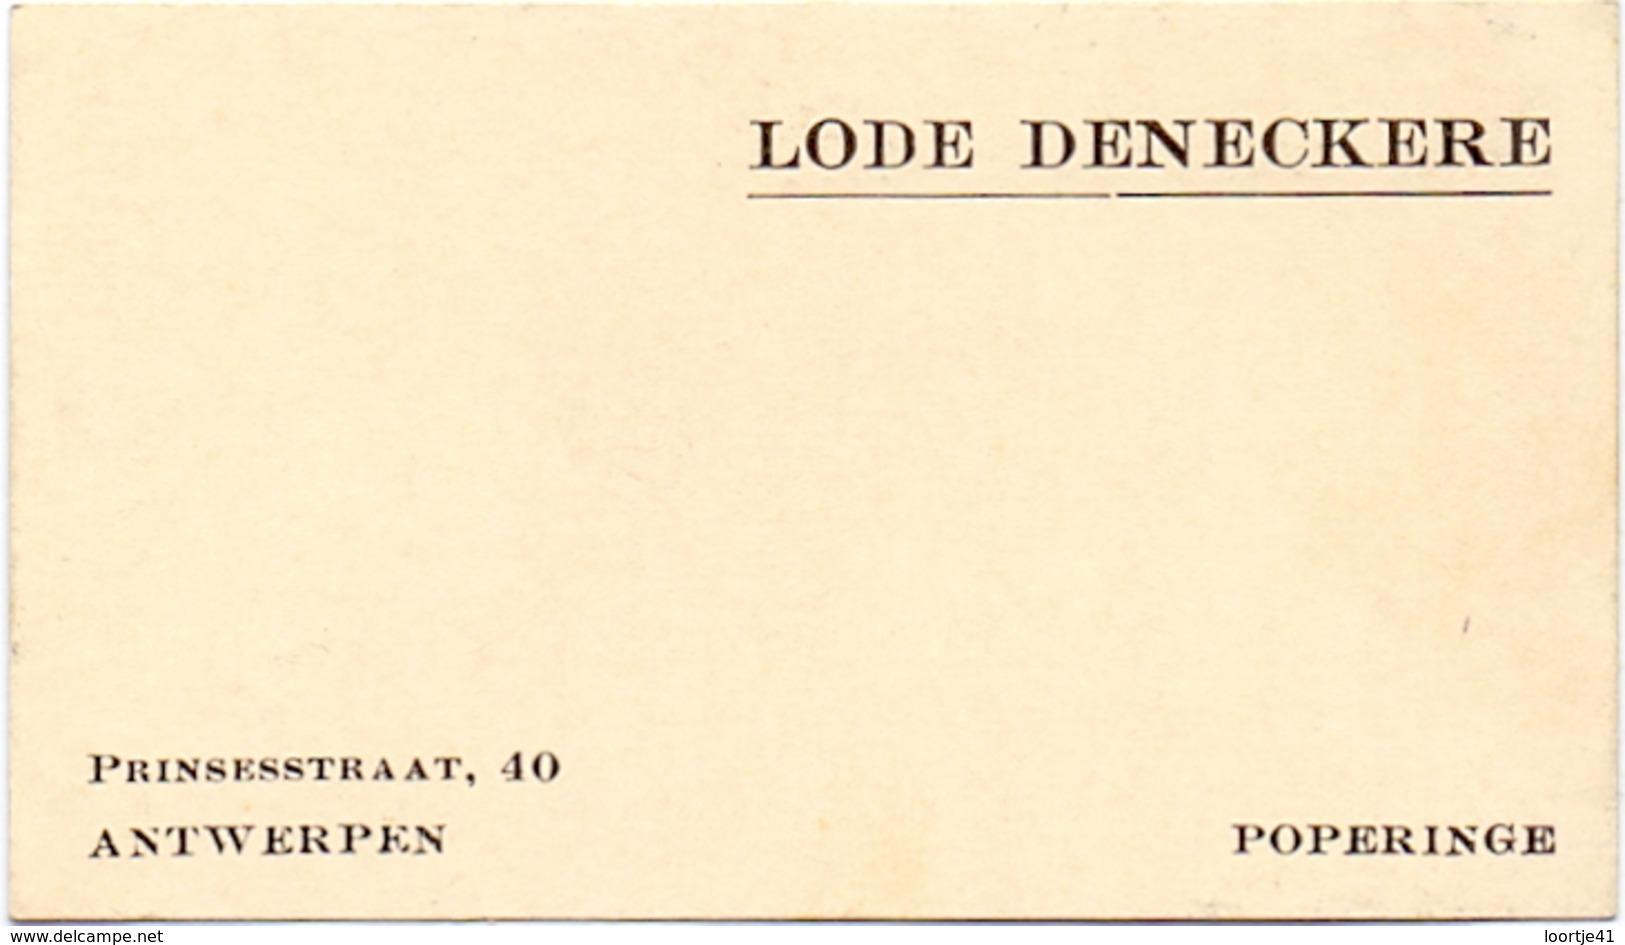 Visitekaartje - Carte Visite - Lode Deneckere - Poperinge - Cartes De Visite